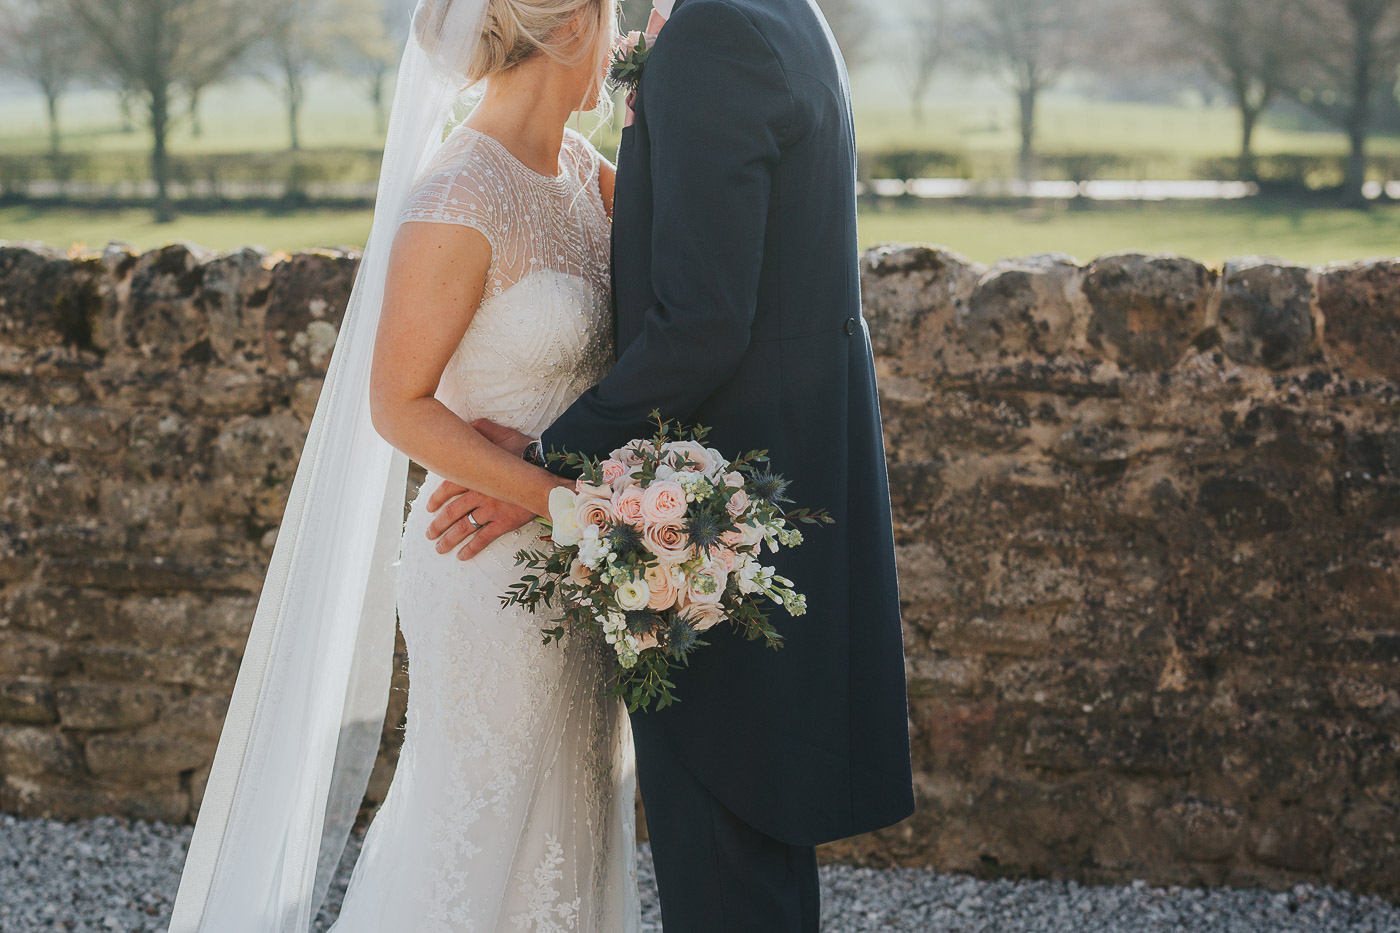 Tithe+Barn+-+Laura+Calderwood+Photography+-+29.3.19+-+Mr+&+Mrs+Lancaster290319-107 (2).jpg